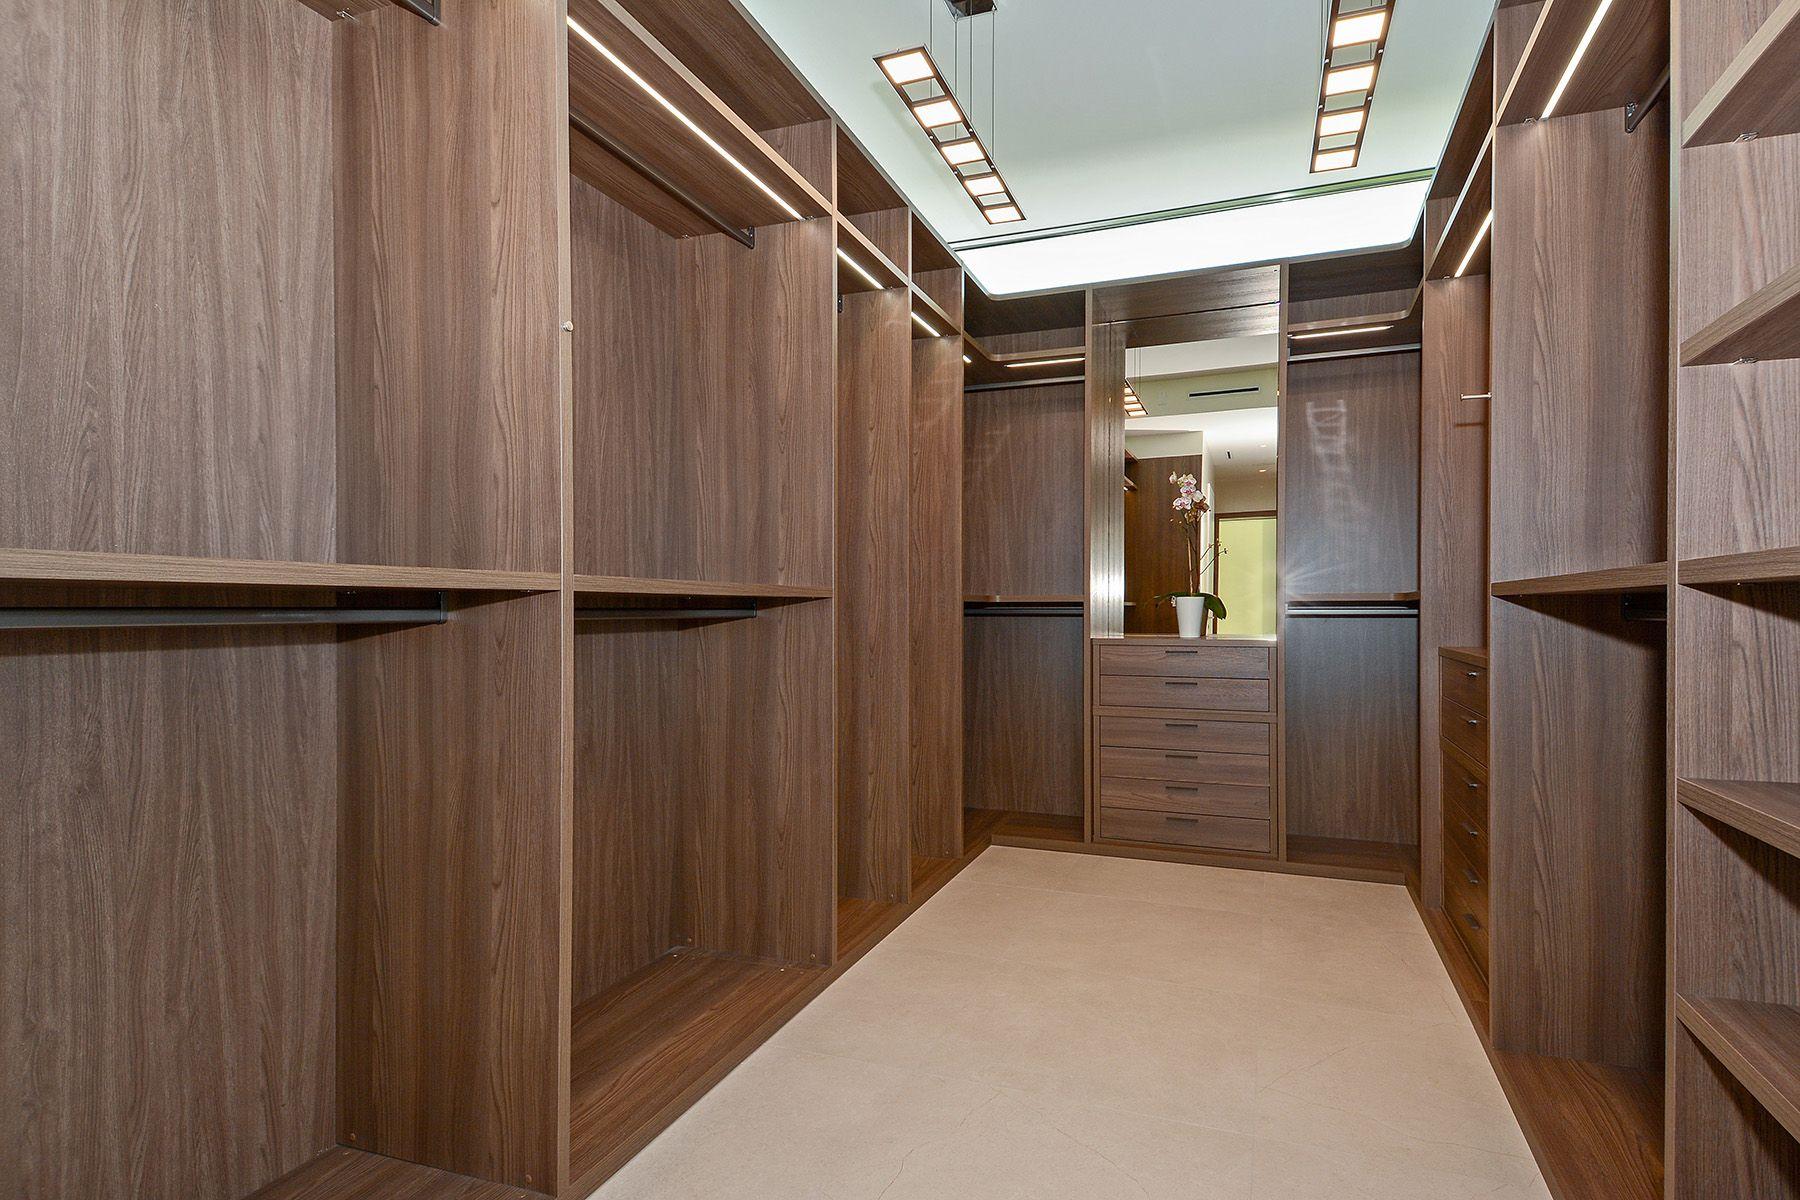 15_6480_Allison_Rd_Master_Bedroom_Closet_HR.0.jpg